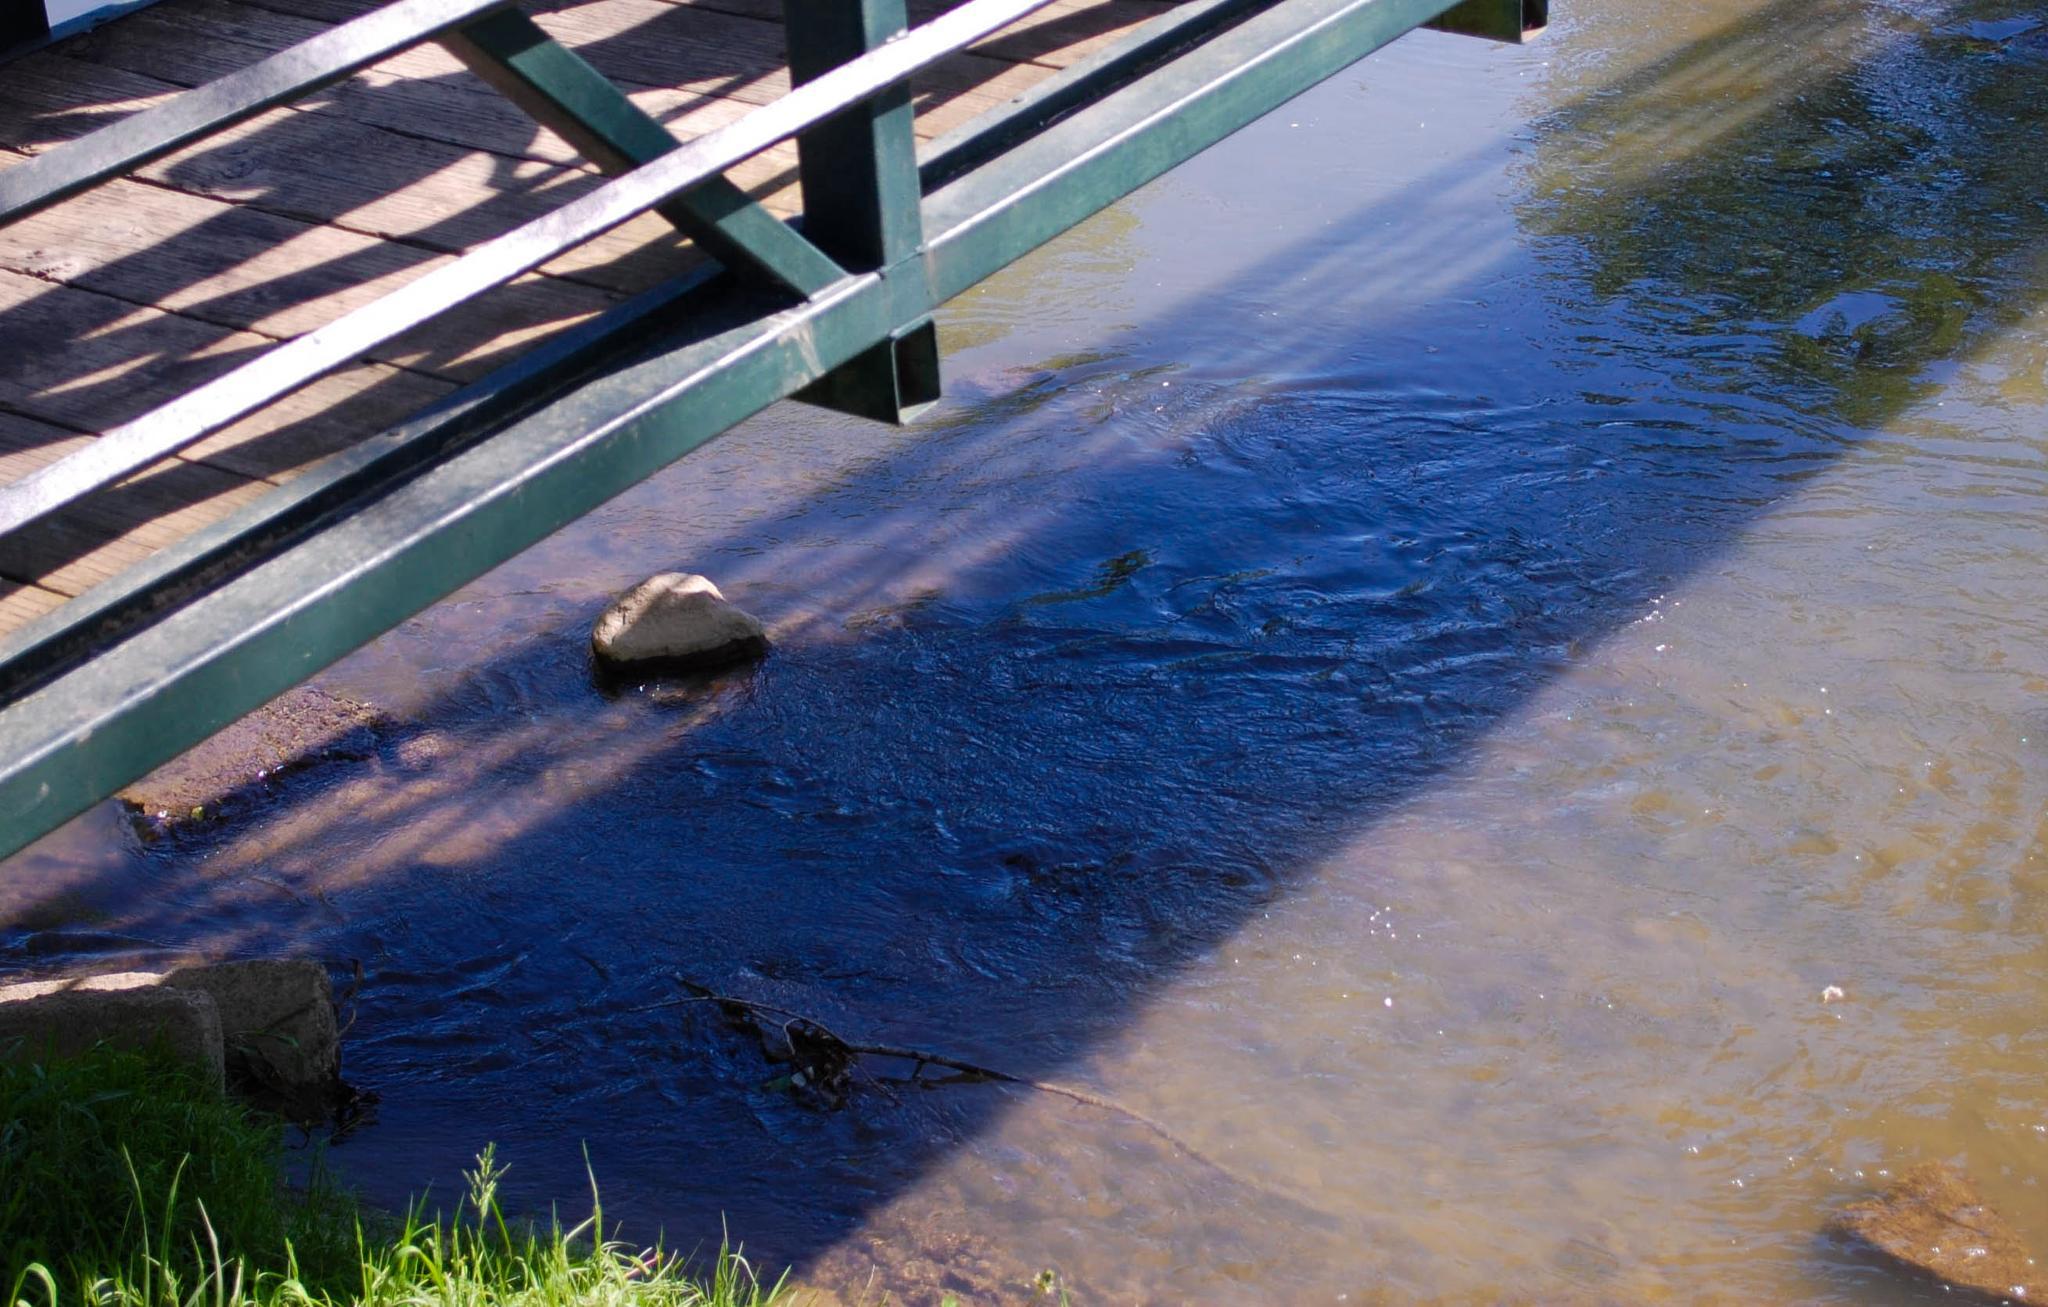 The Water Below by monicatrouble